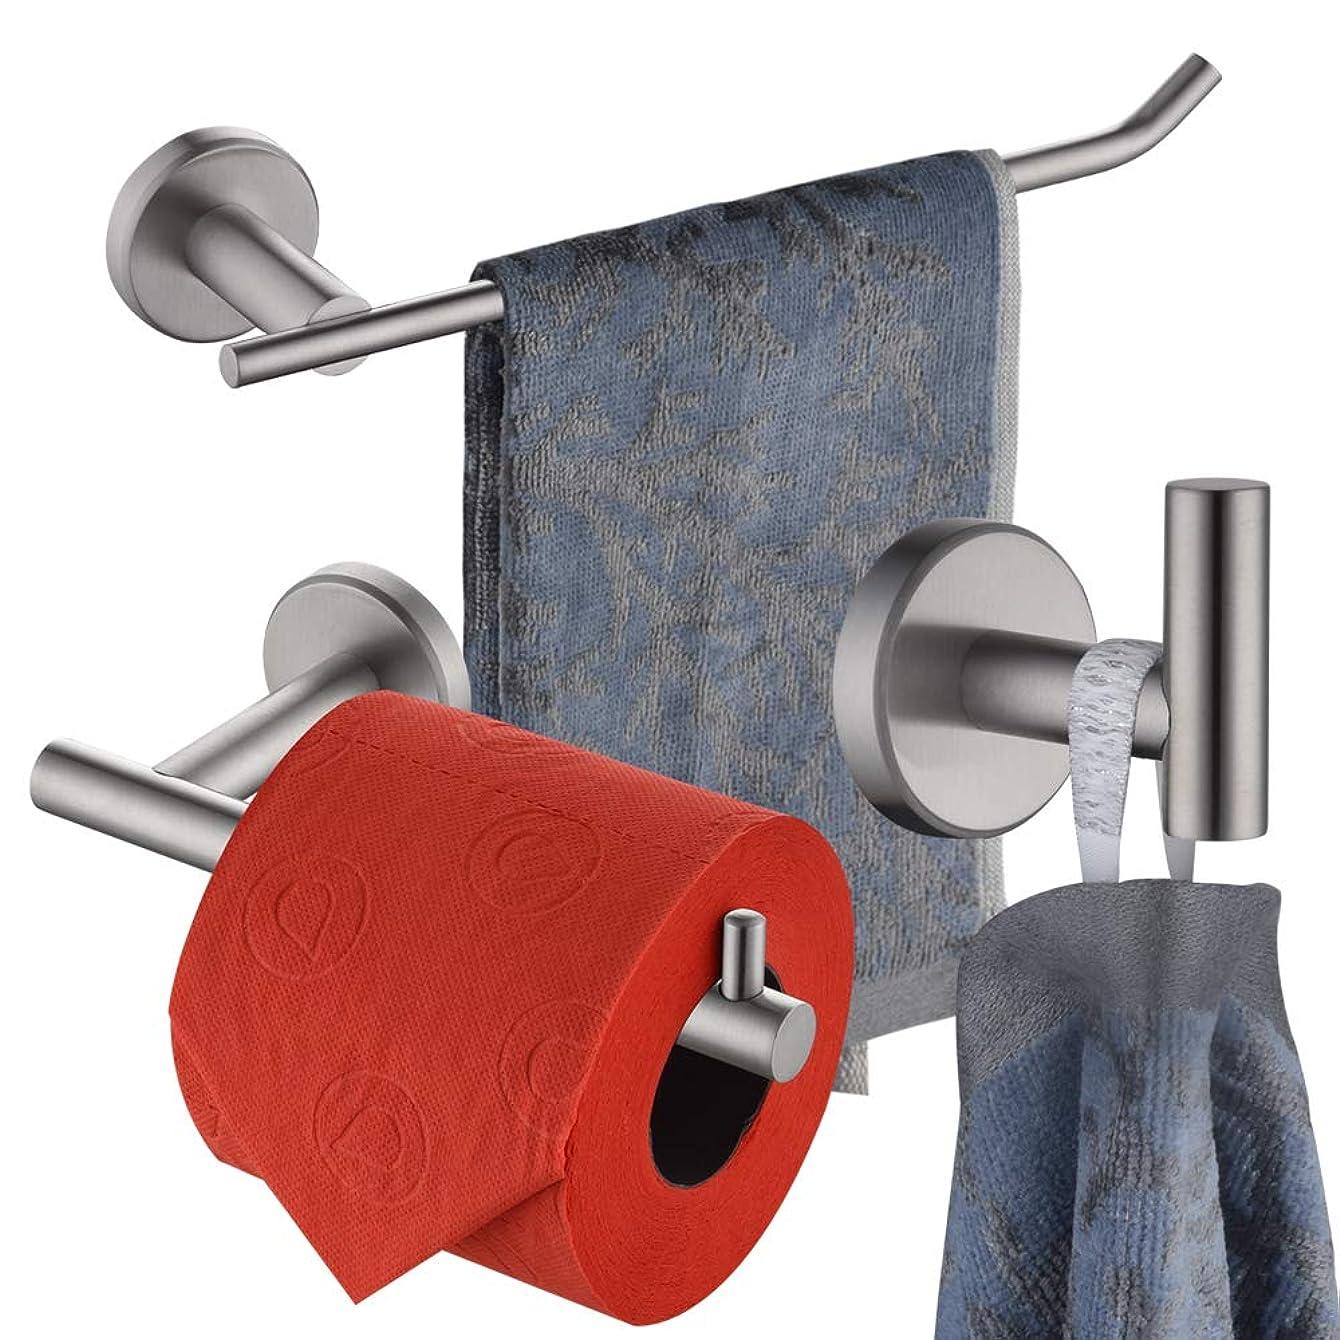 JQK Bath Hardware Towel Bar Accessory Set, 3-Piece Bathroom Accessory Set Brushed Finished Wall Mount Includes 9